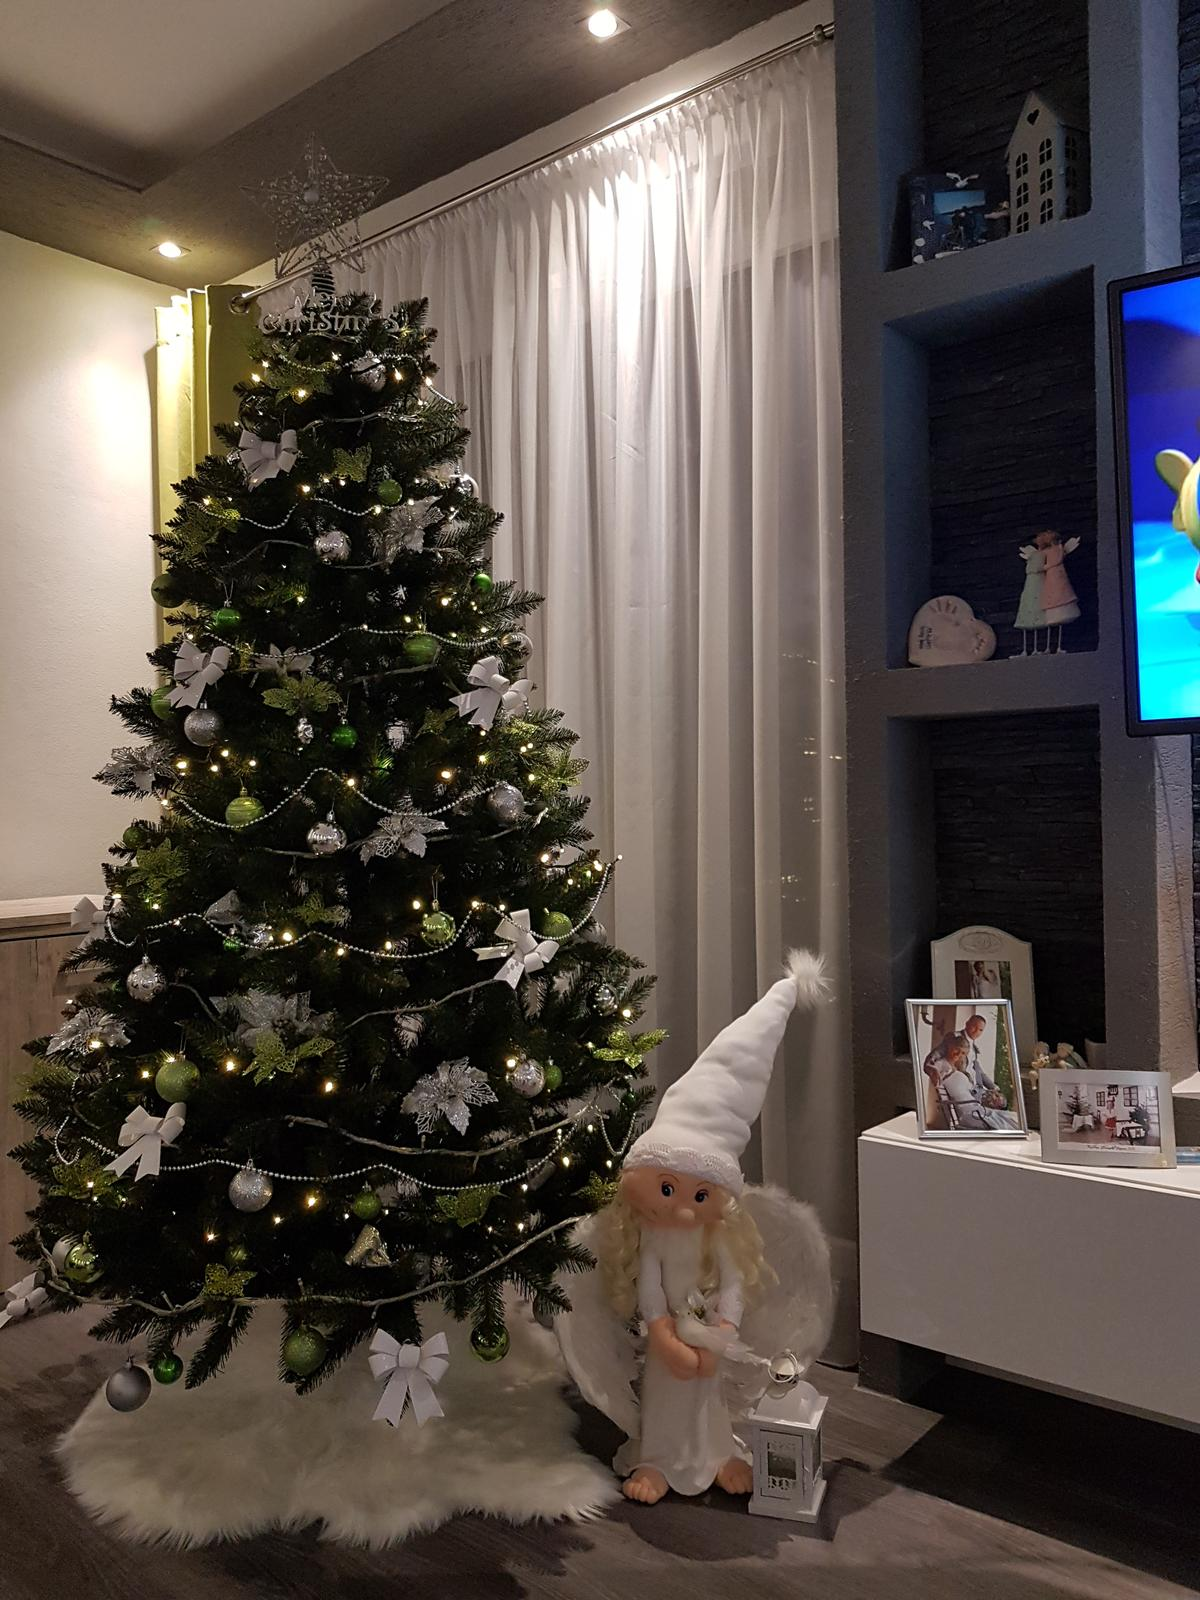 Zaciname stavat nas sen - tento rok v novom domceku mame Vianoce trosku skor, nech si to uzijeme :-)